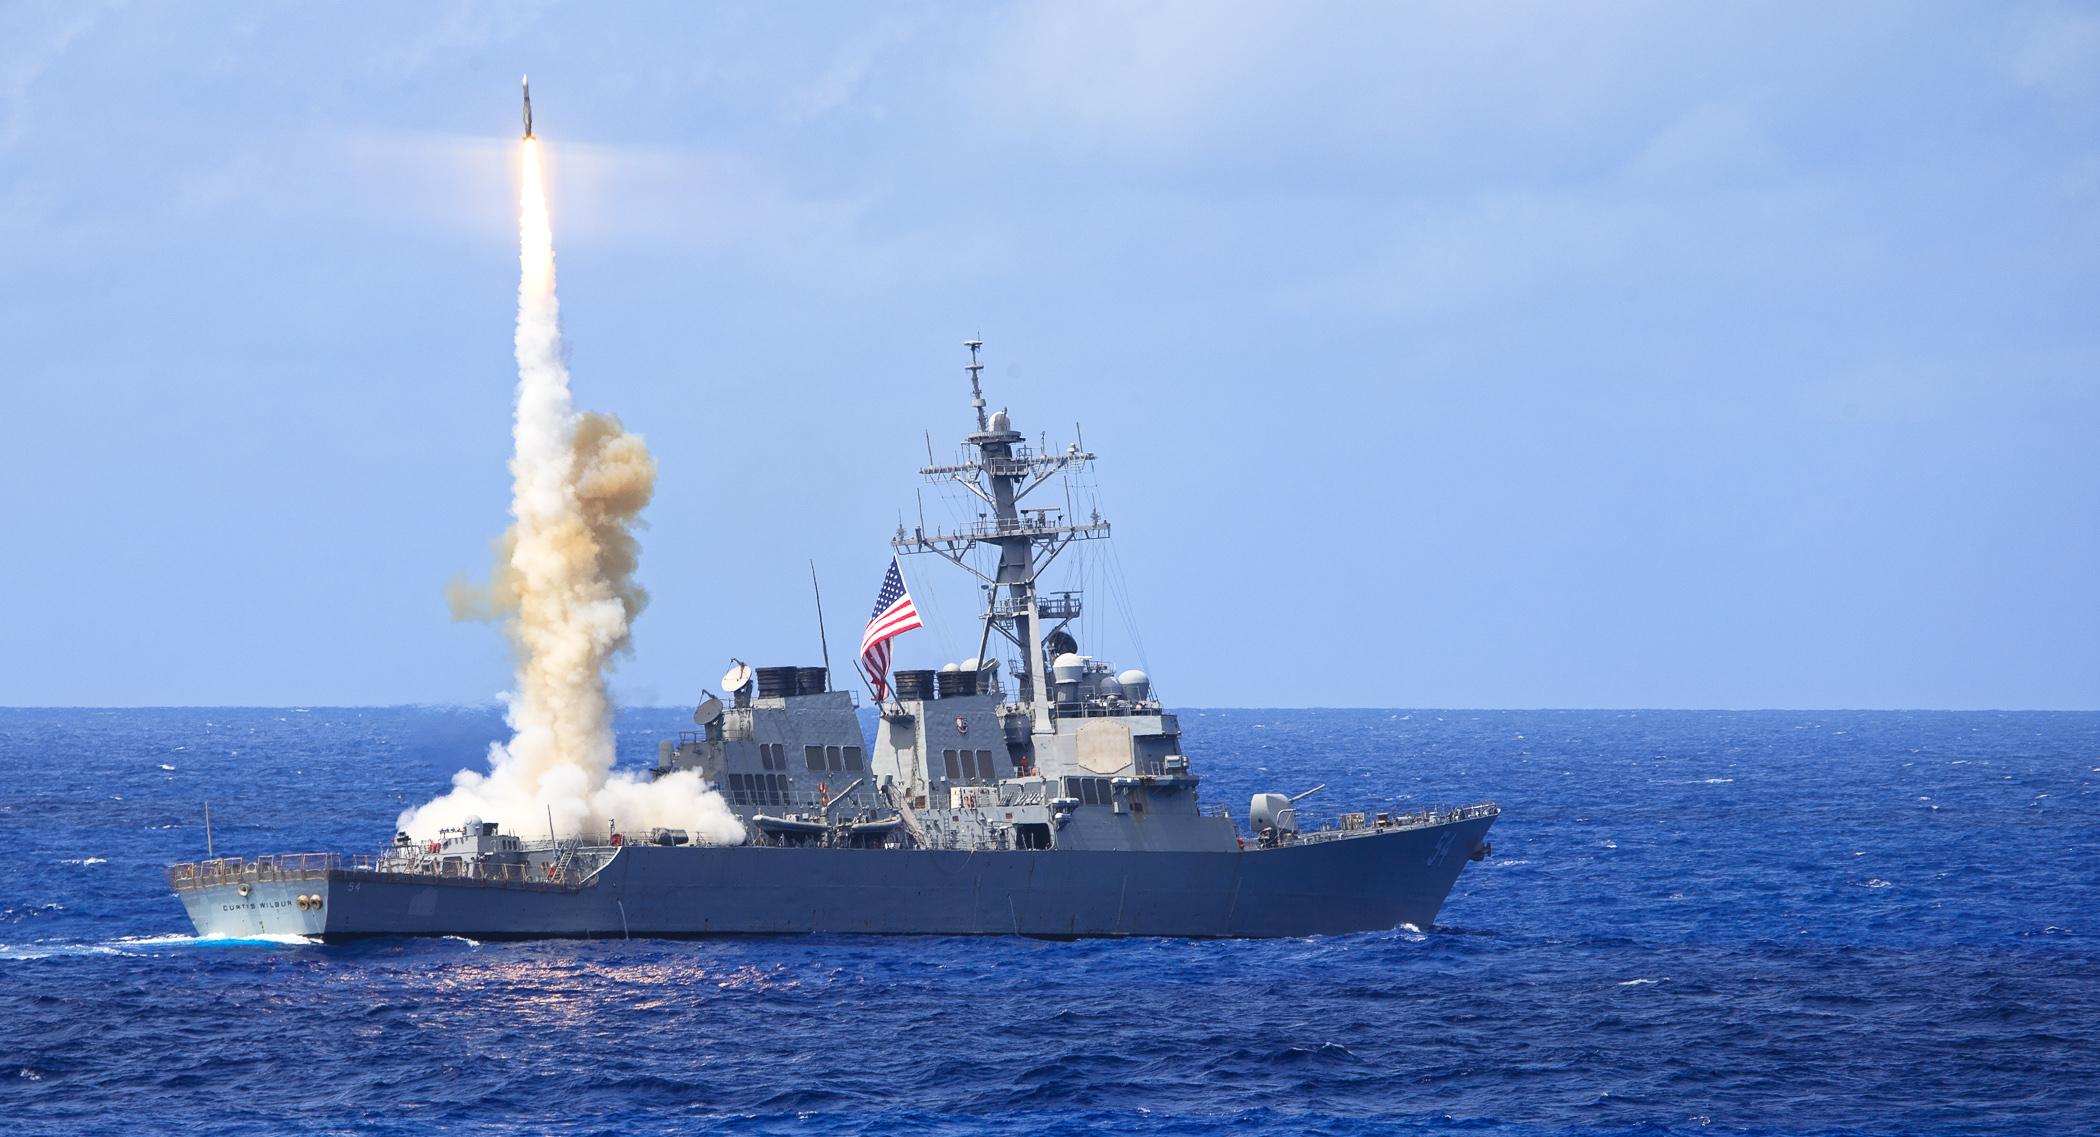 USS CURTIS WILBUR DDG-54 Multi Sail 2014 Bild: U.S. Navy